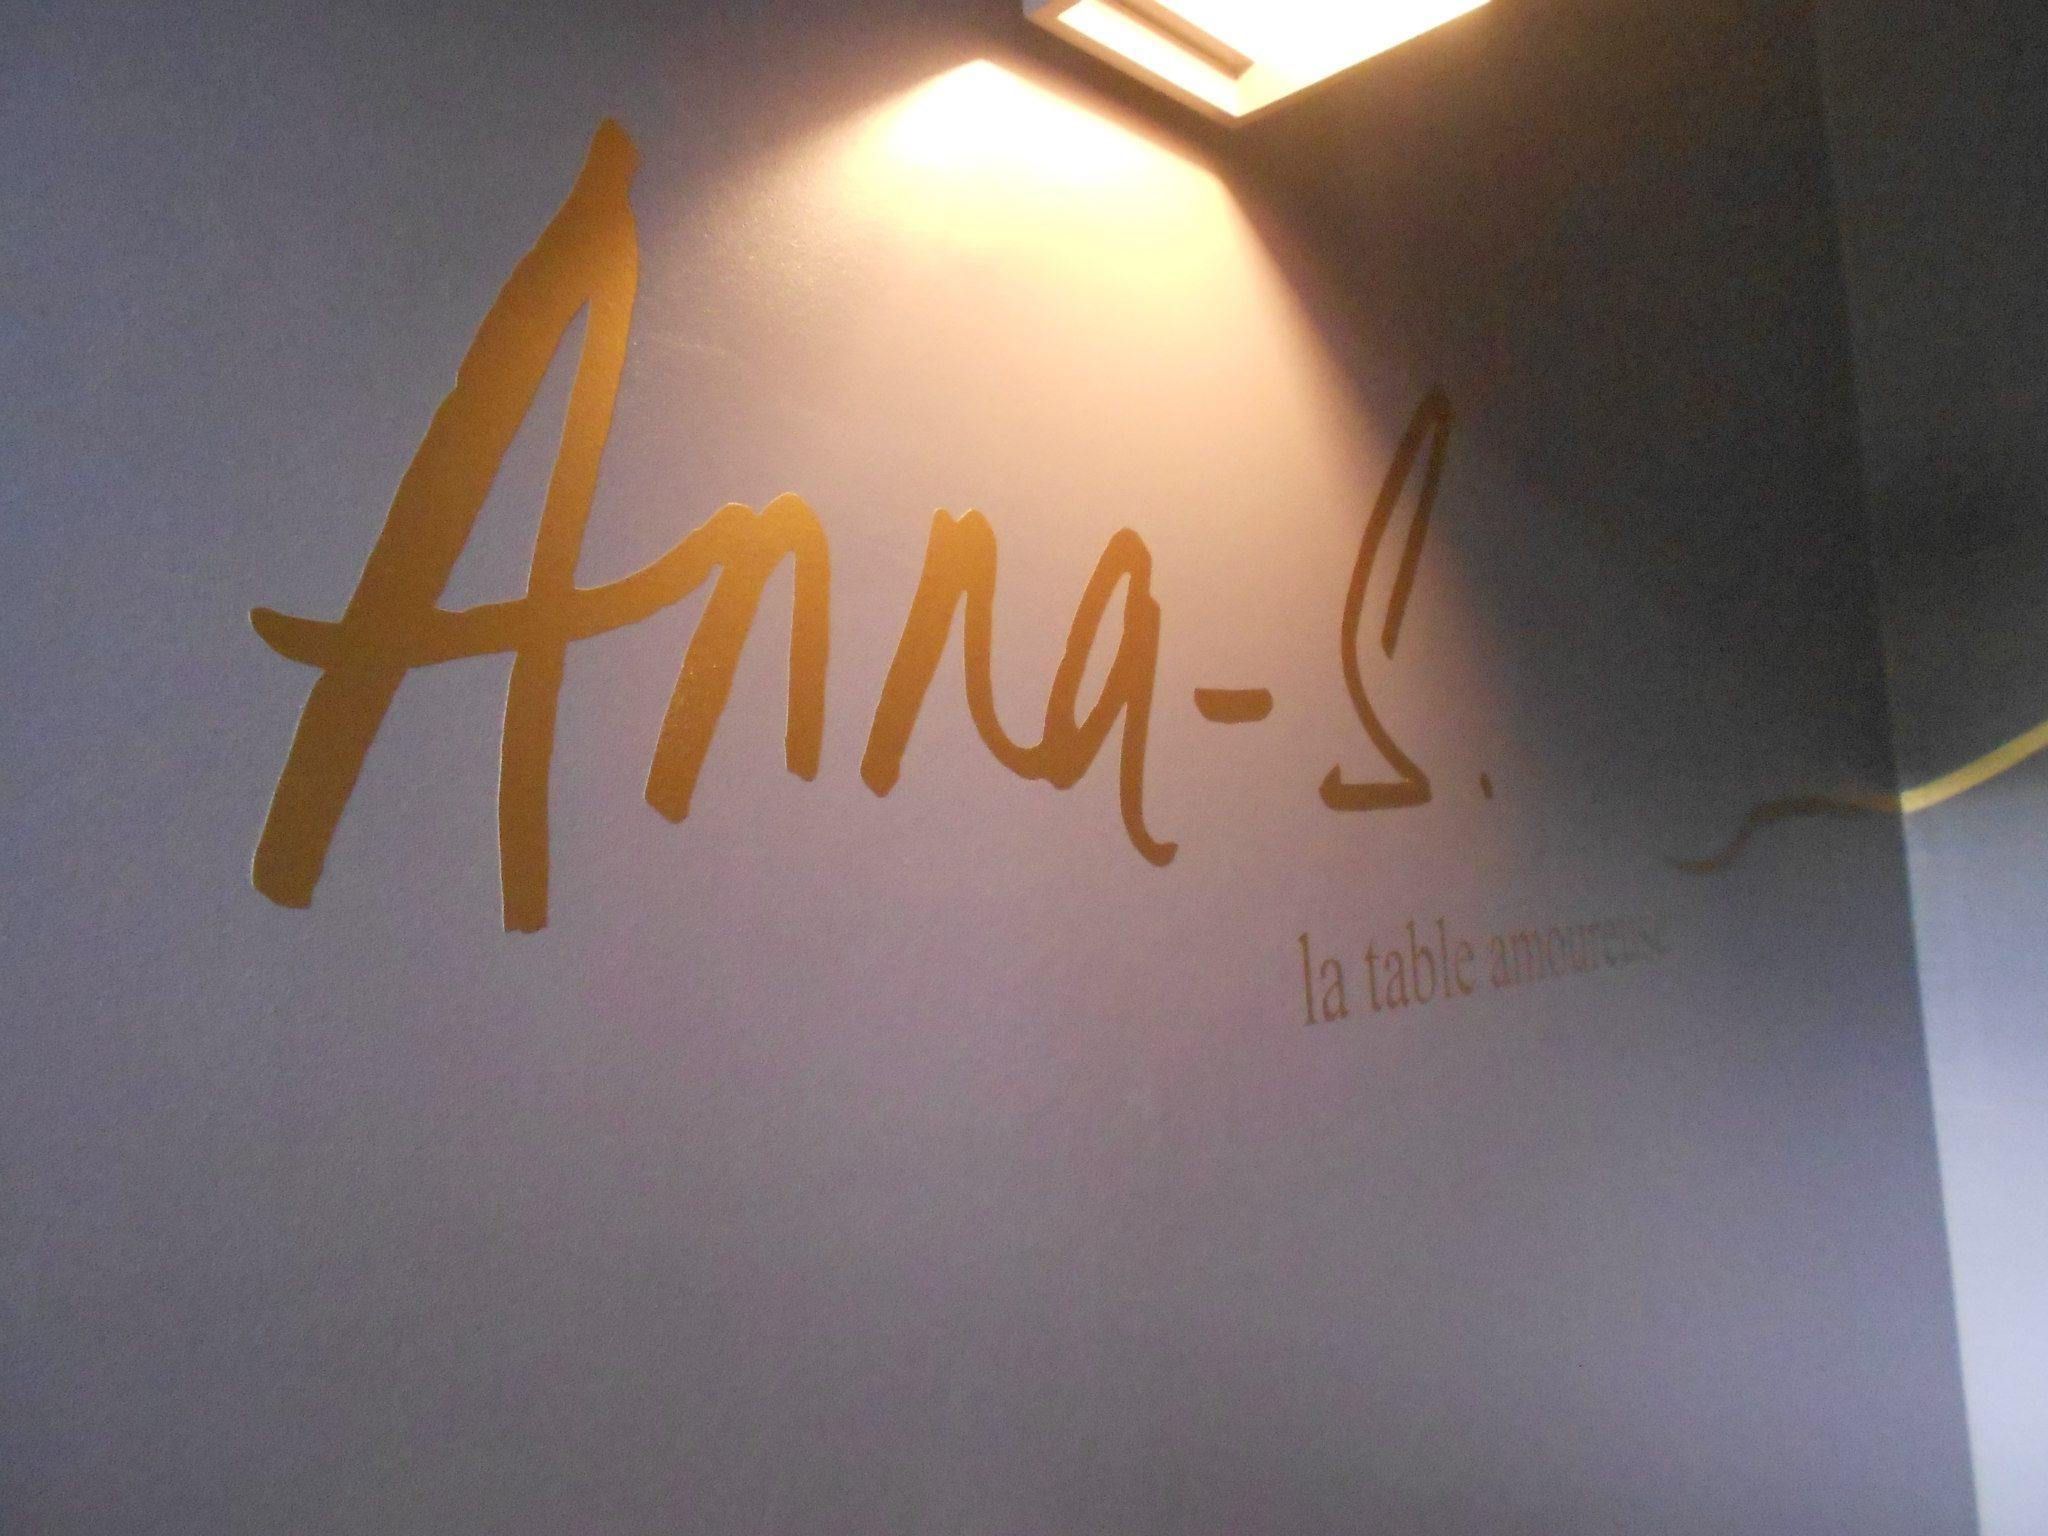 anna s la table amoureuse reims